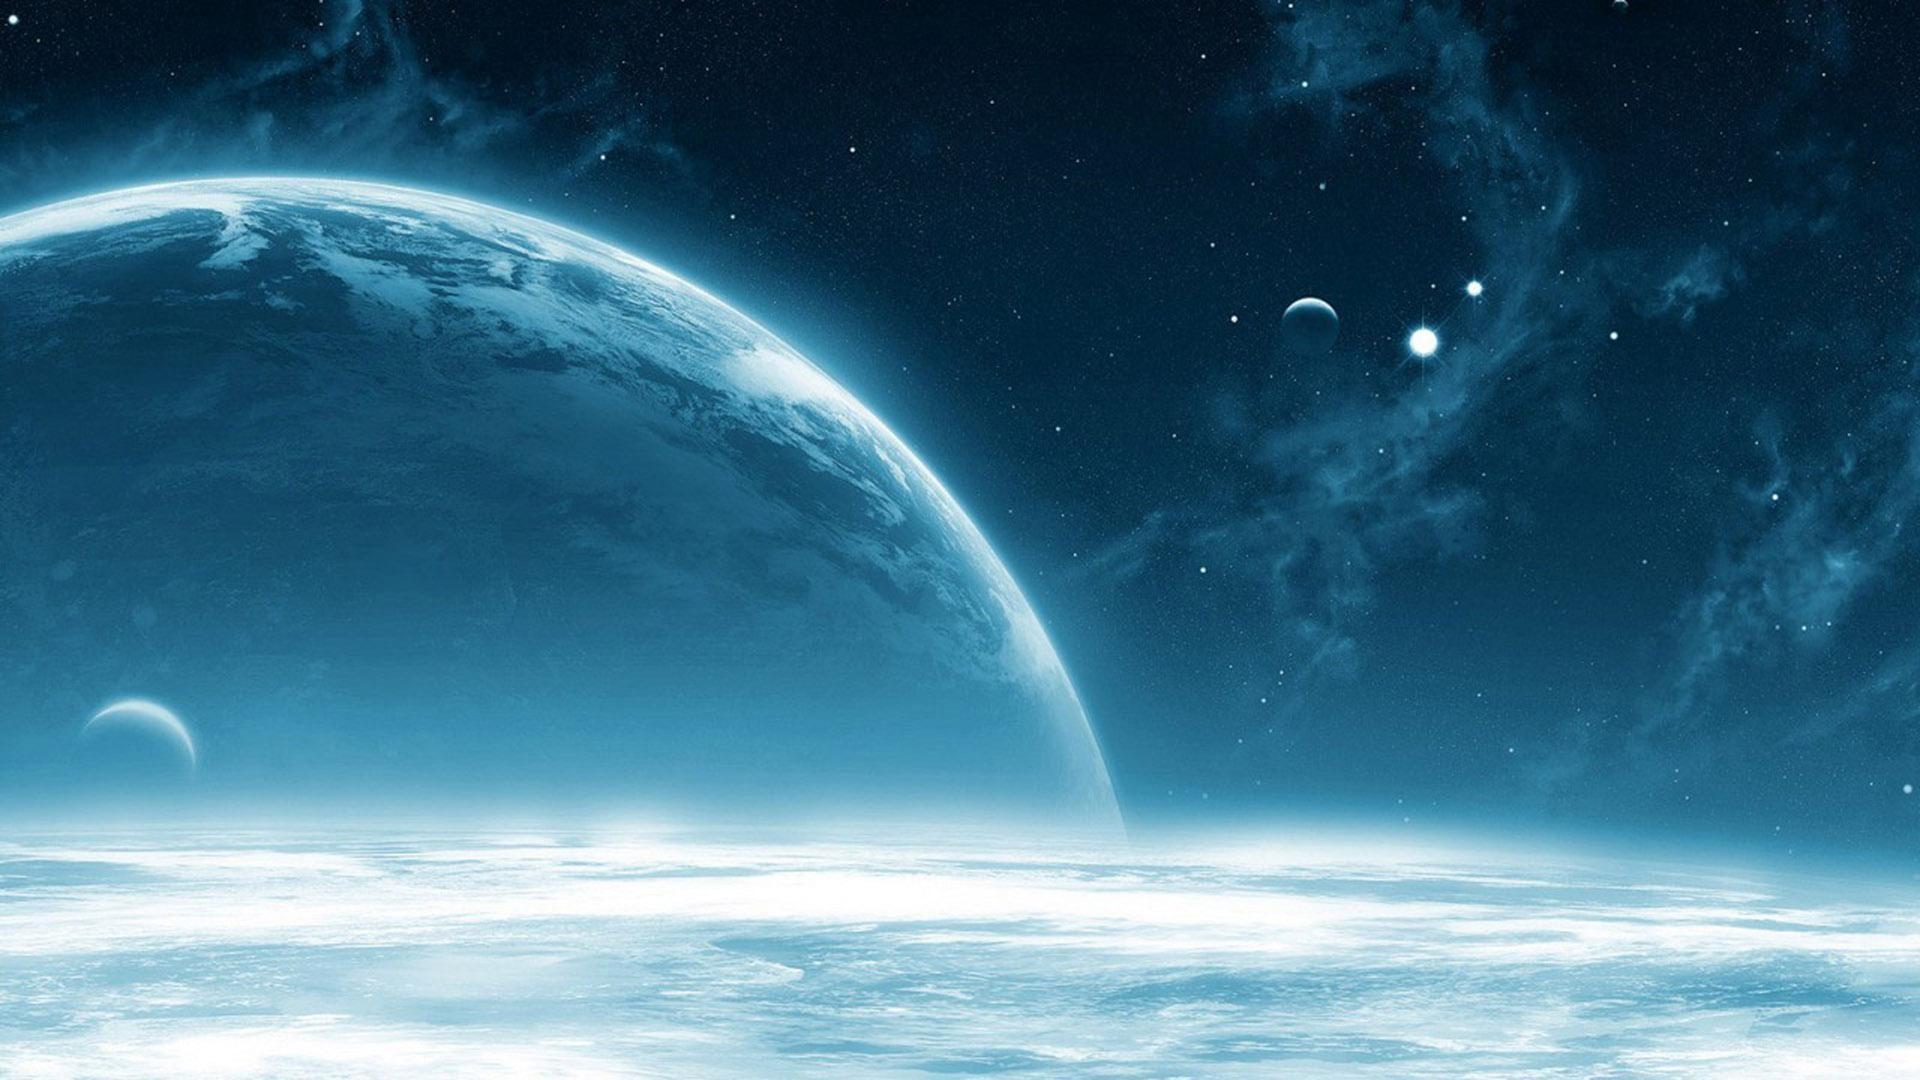 Desktop Backgrounds Space